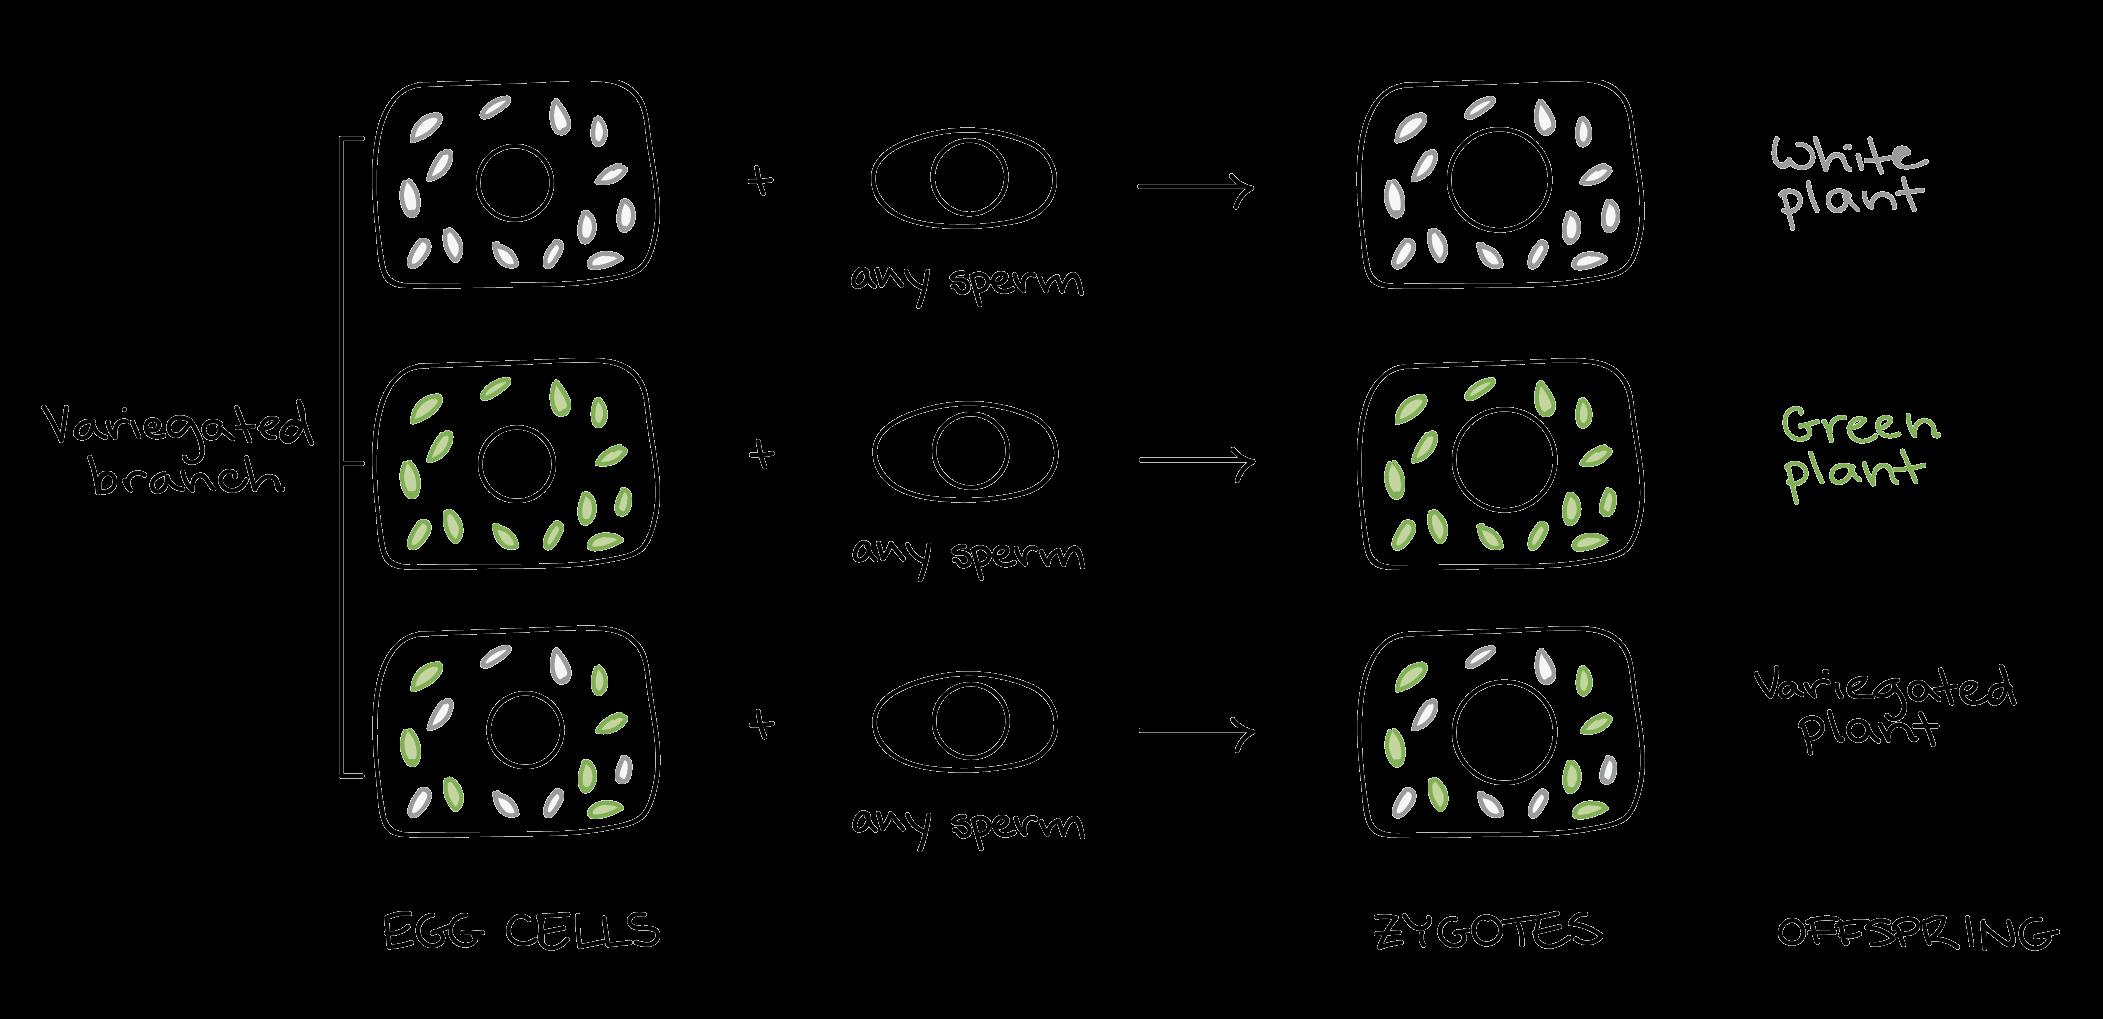 Aneuploidy & chromosomal rearrangements article